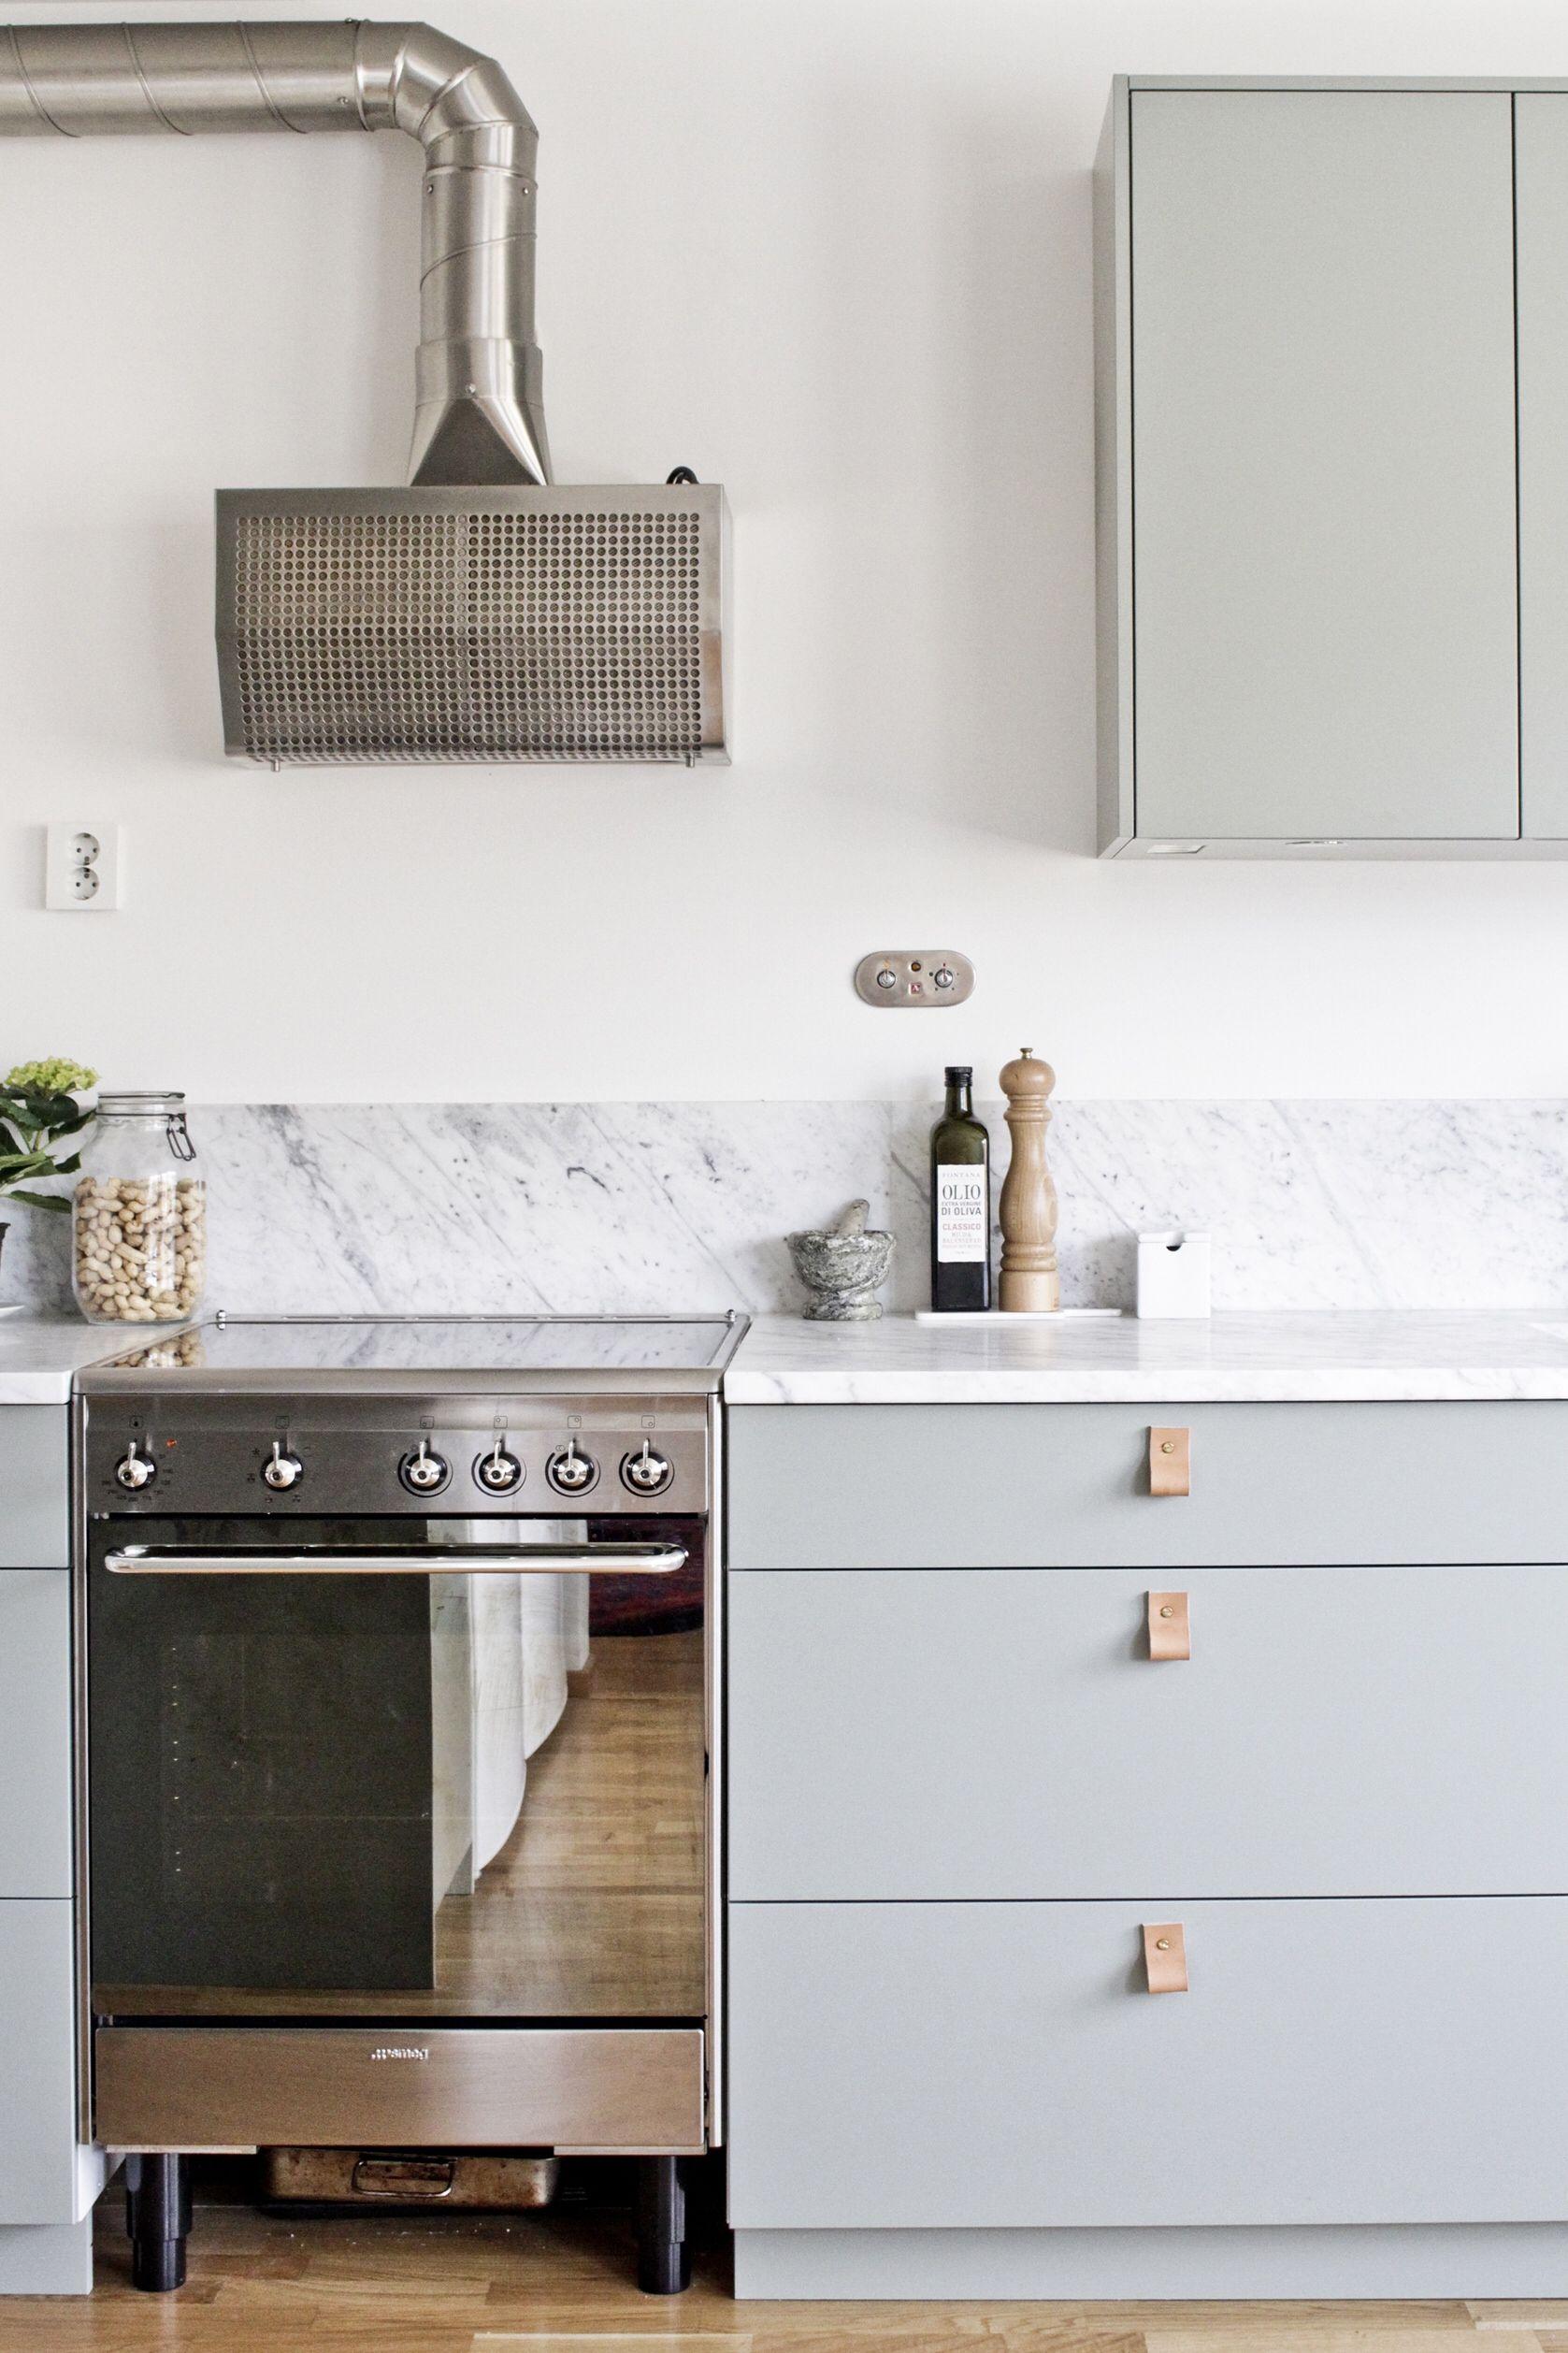 Handtag I Eko Lader Massing Maybemay Rental Kitchen Kitchen